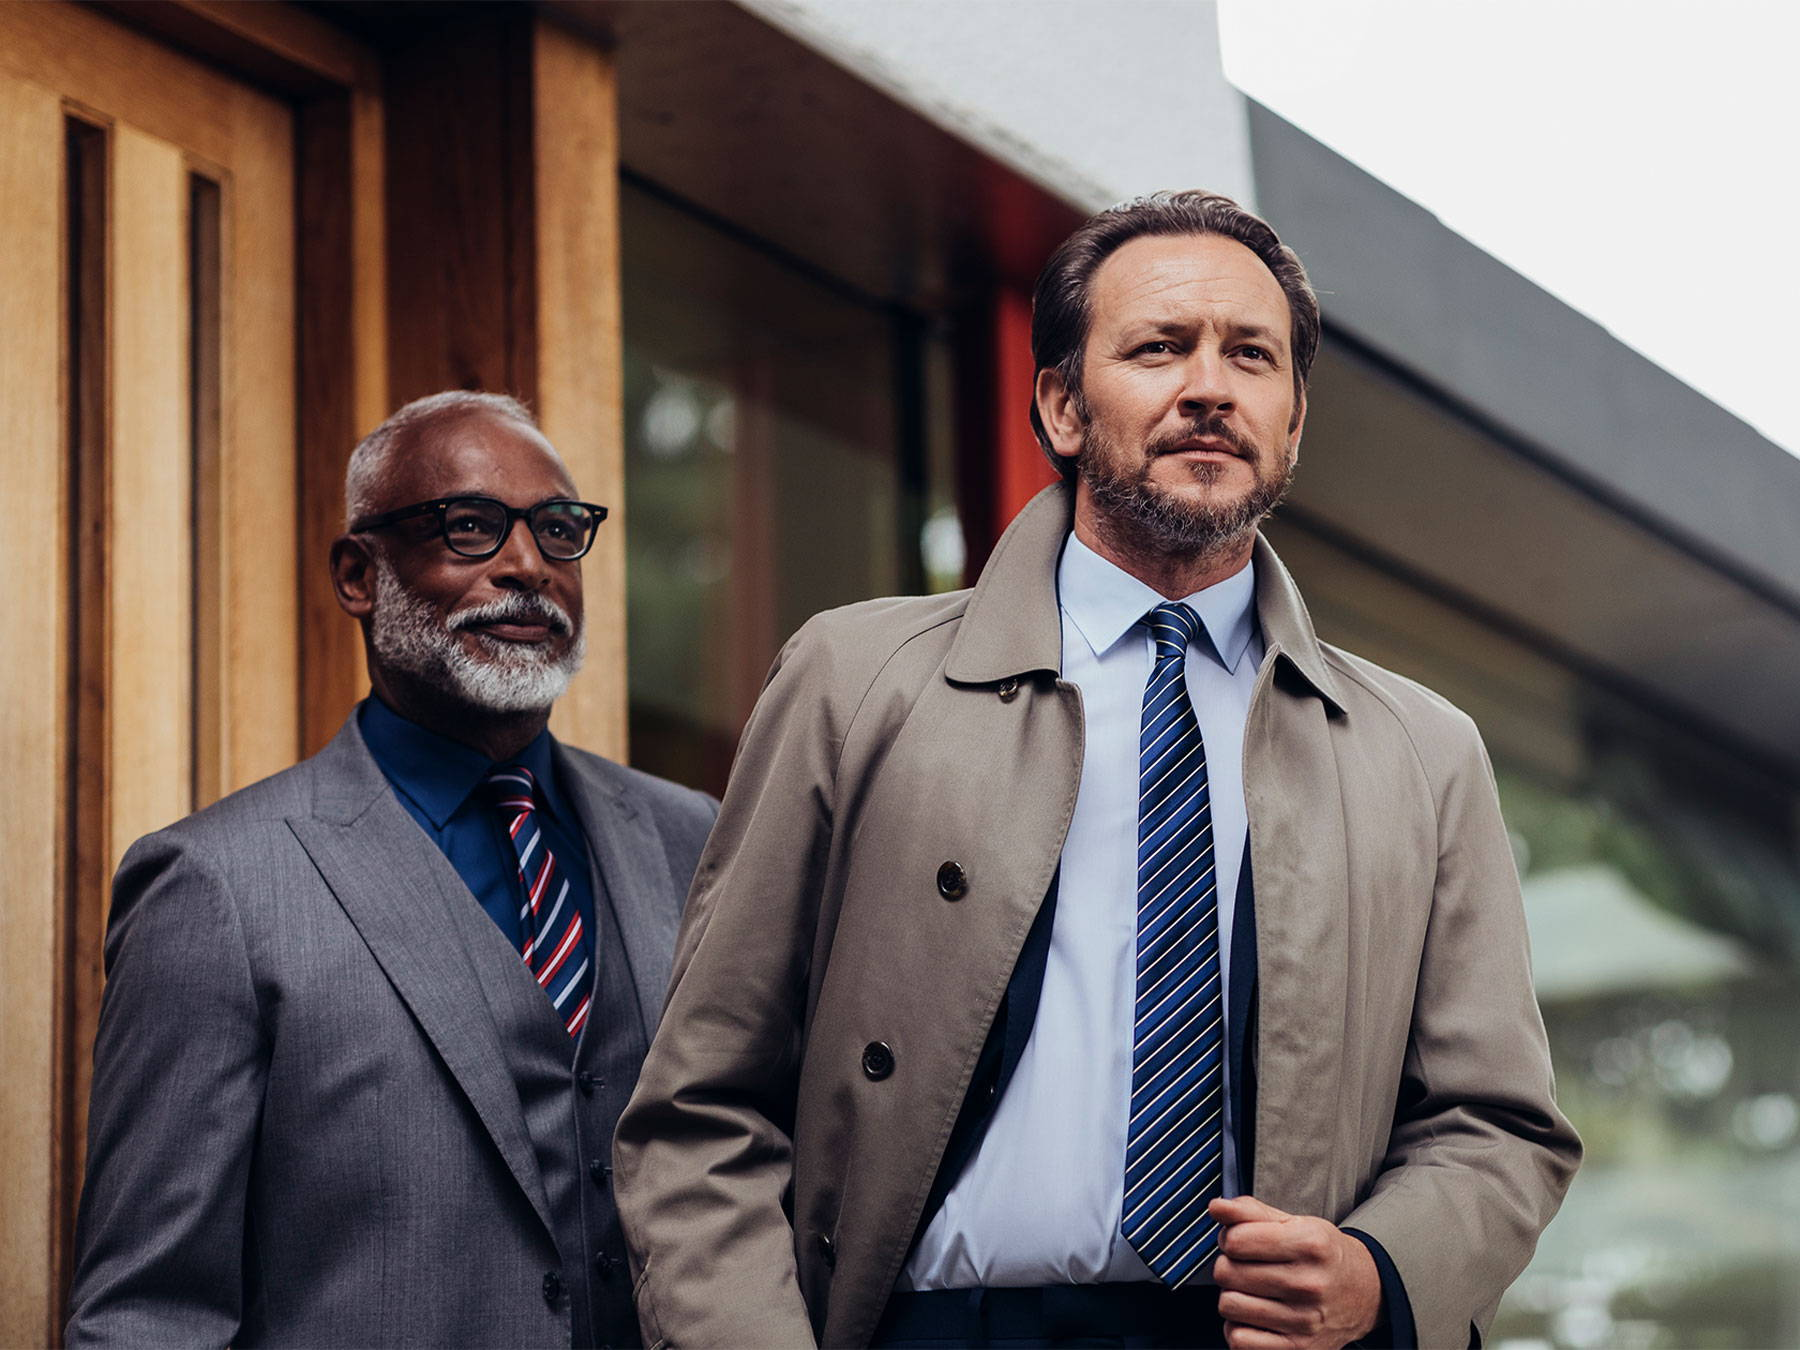 Two men in smart work attire